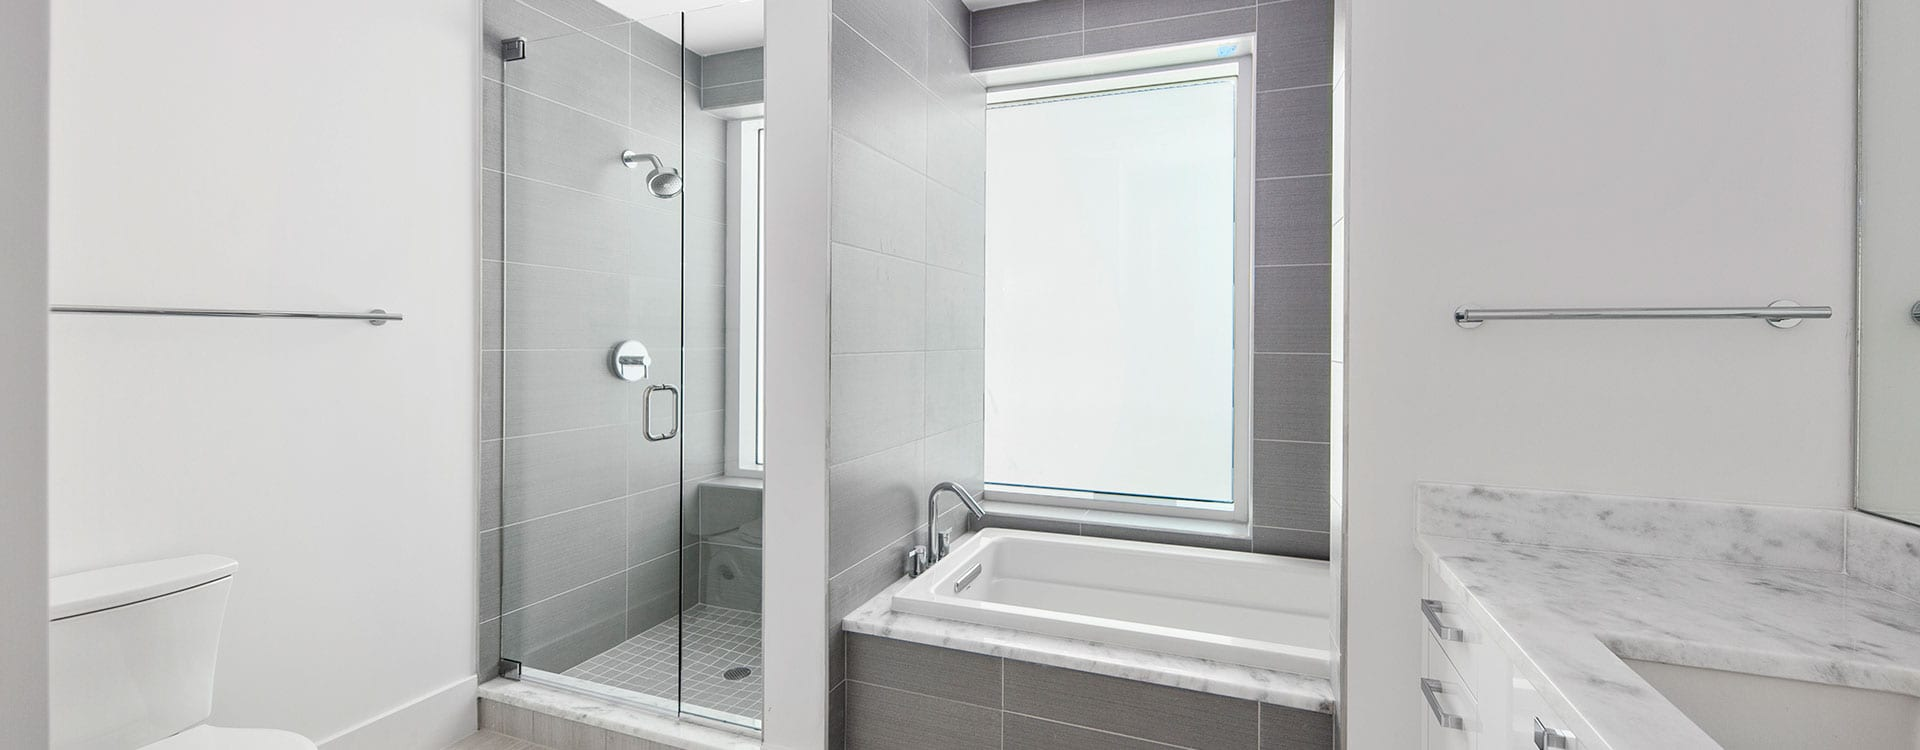 BLVD Residence 1204 Bedroom Bath